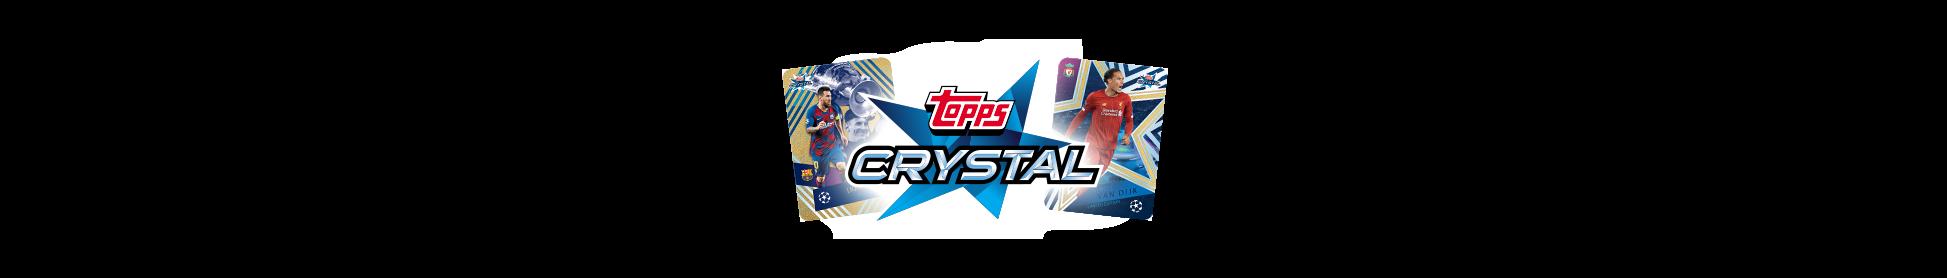 UEFA Champions League Crystal 2019/2020